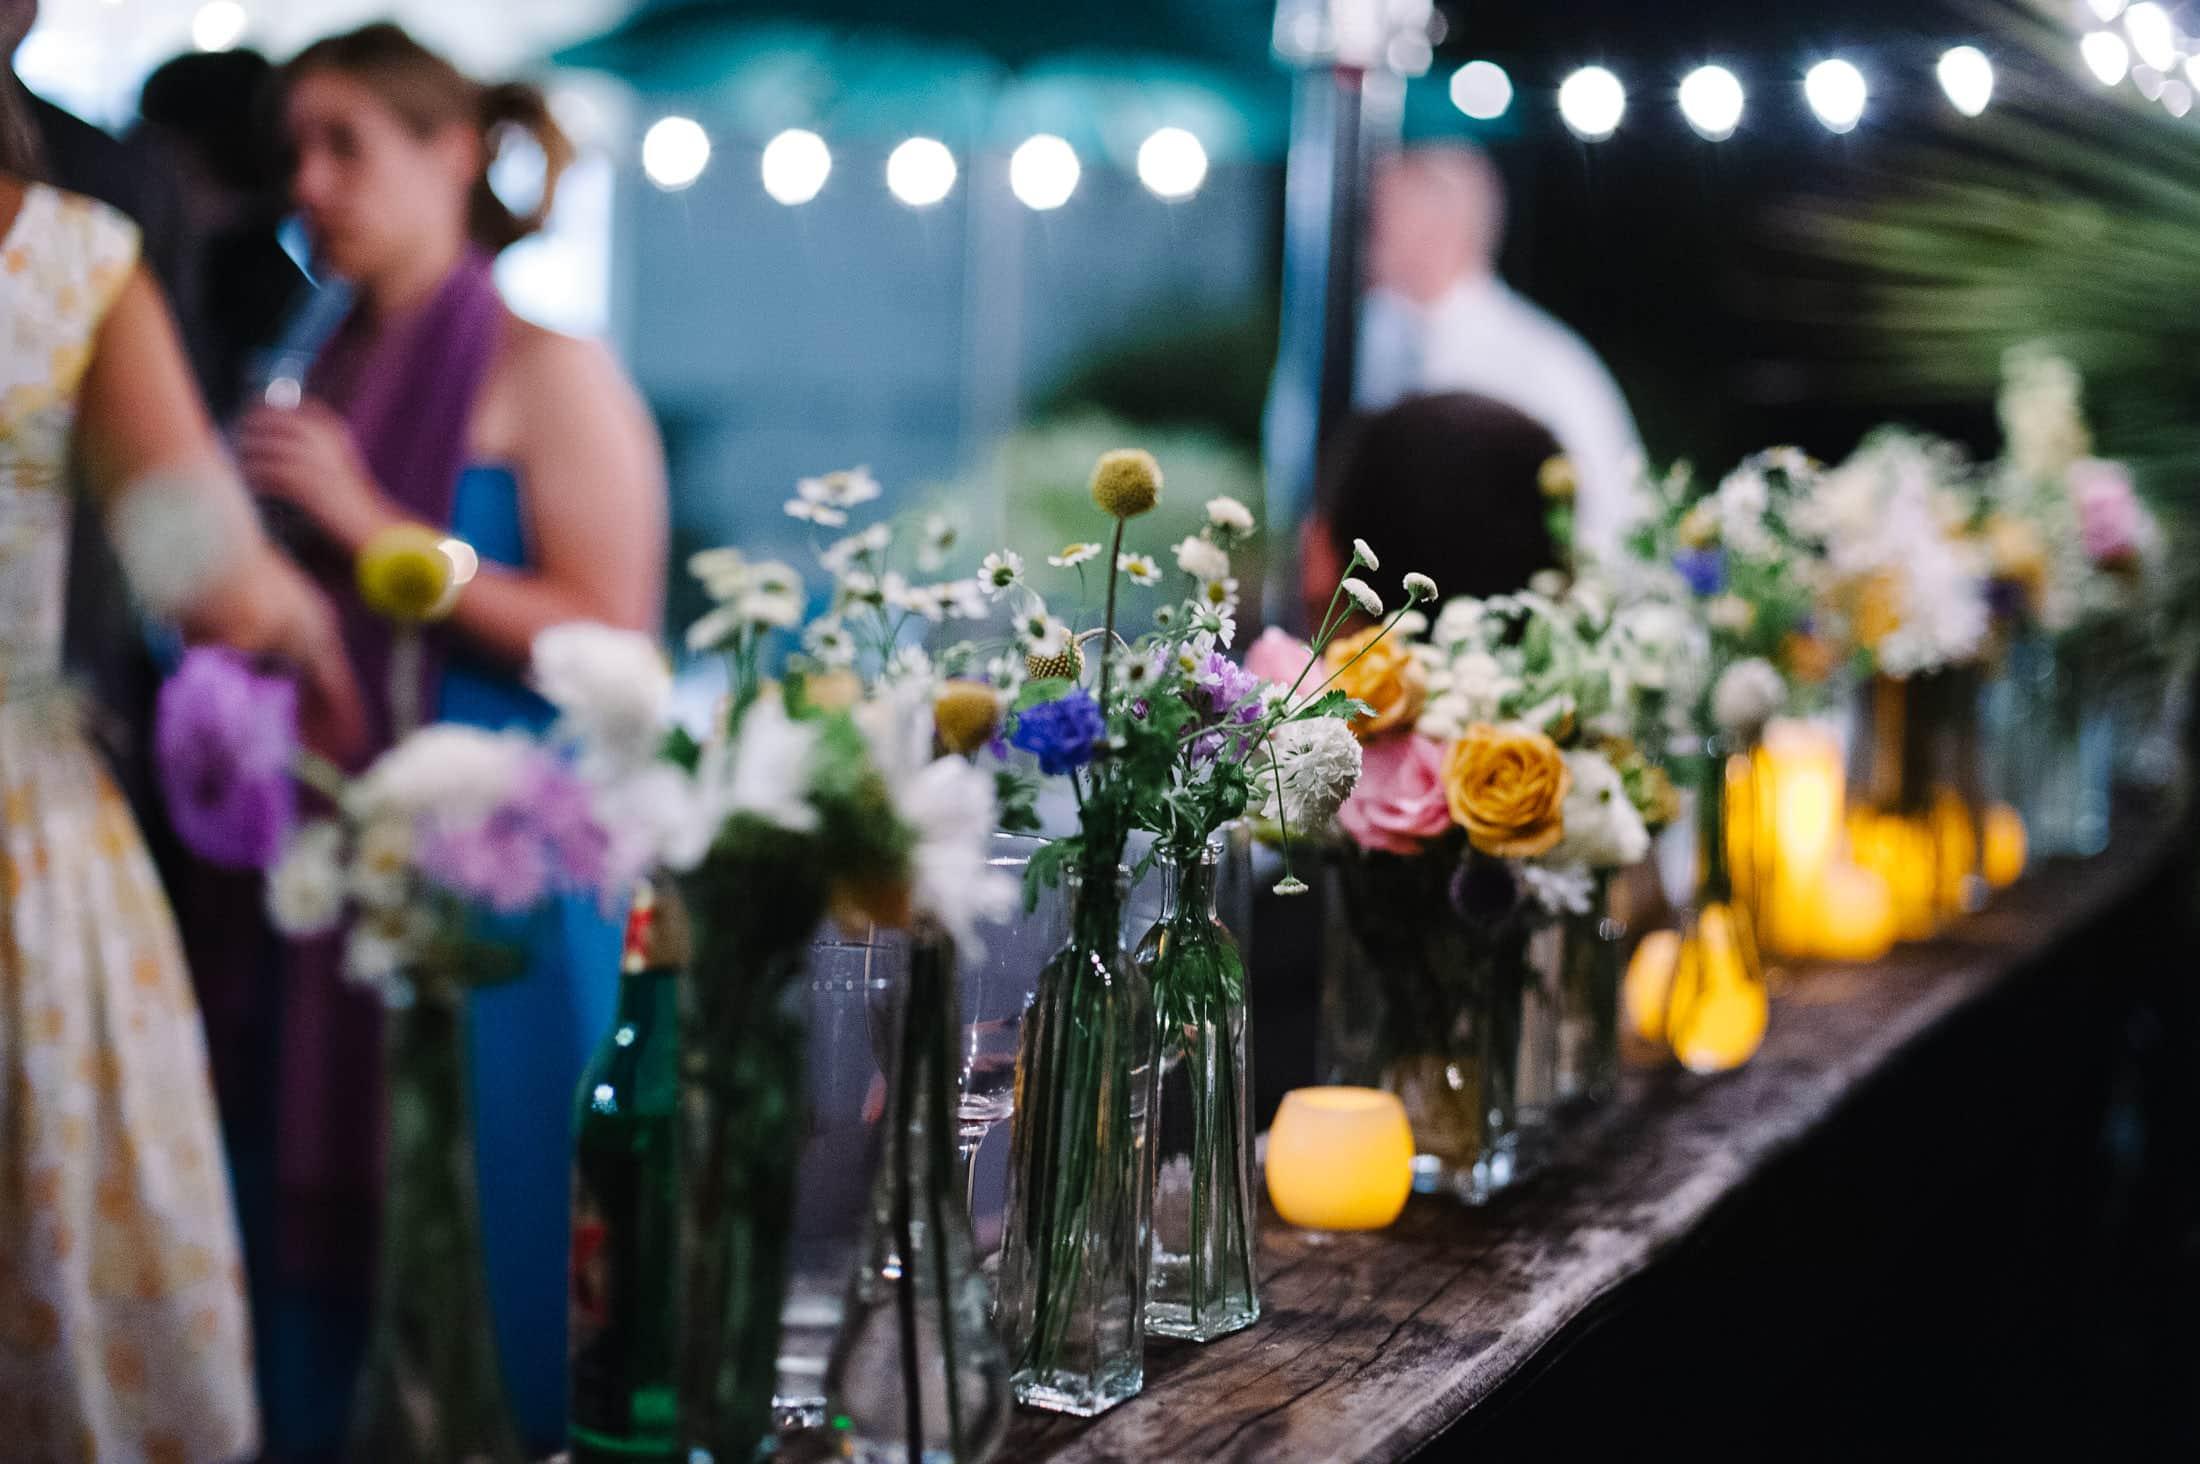 Artistic UC Botanical Garden Wedding detail of flowers